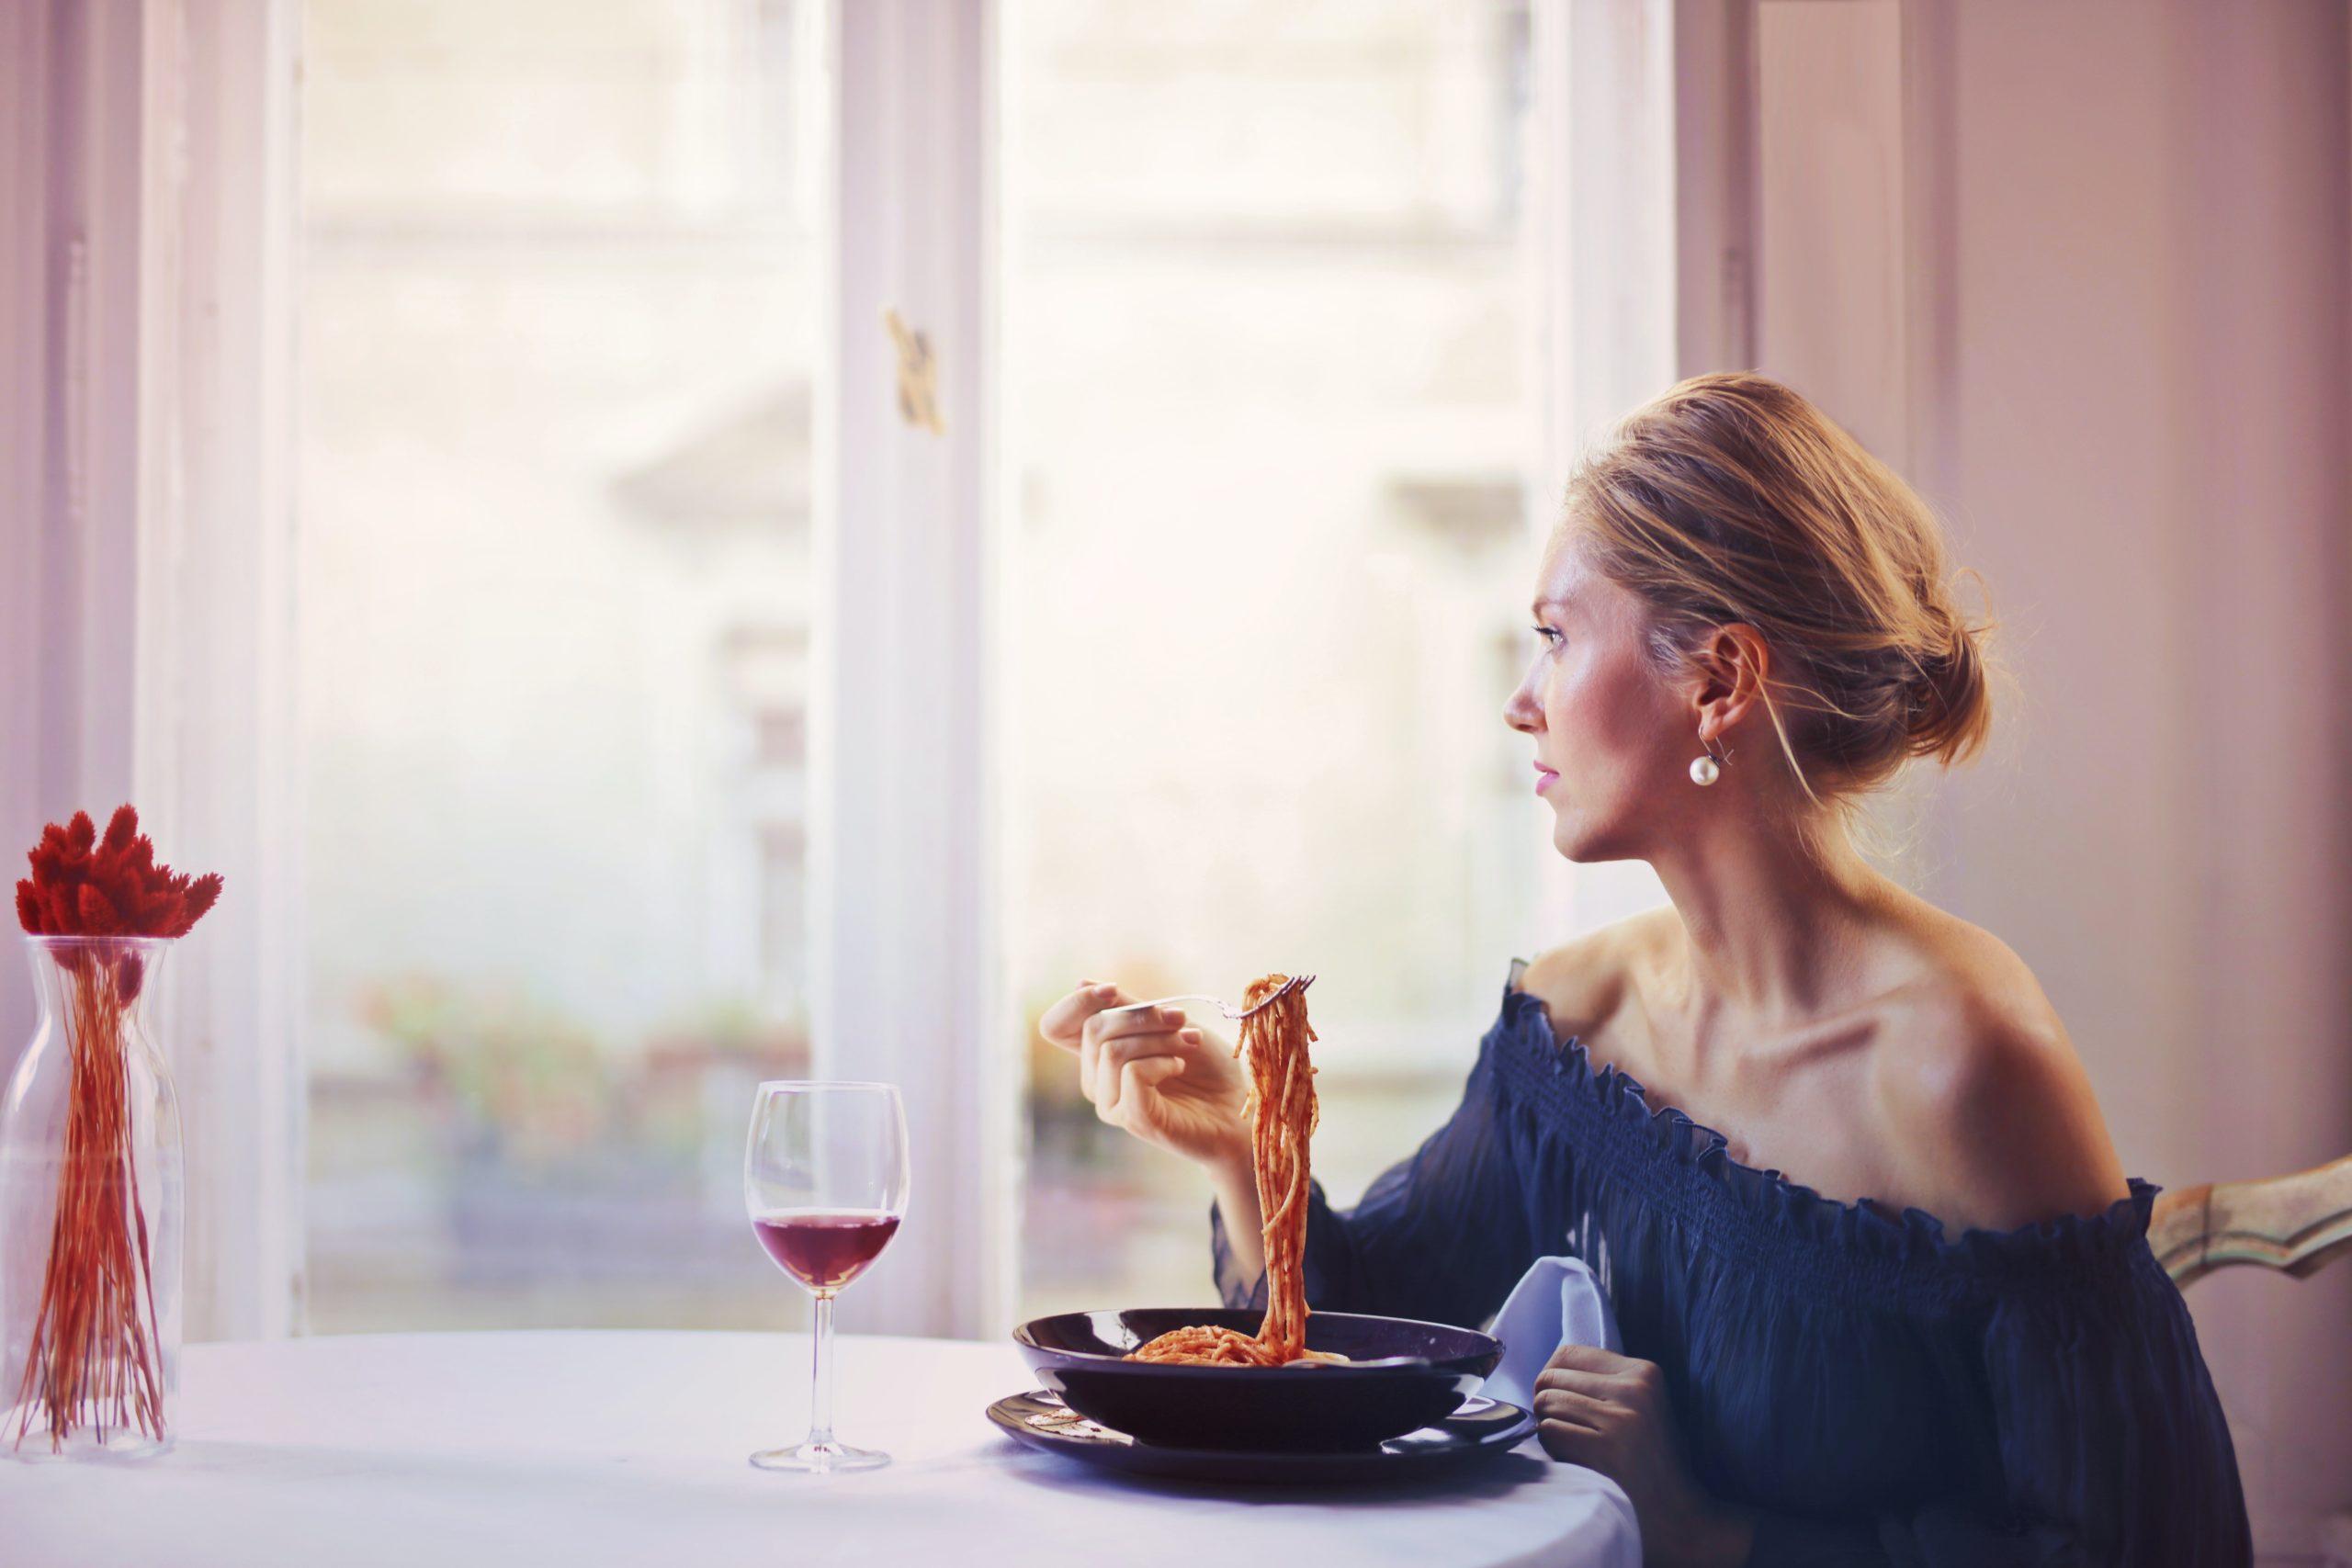 Manger seul